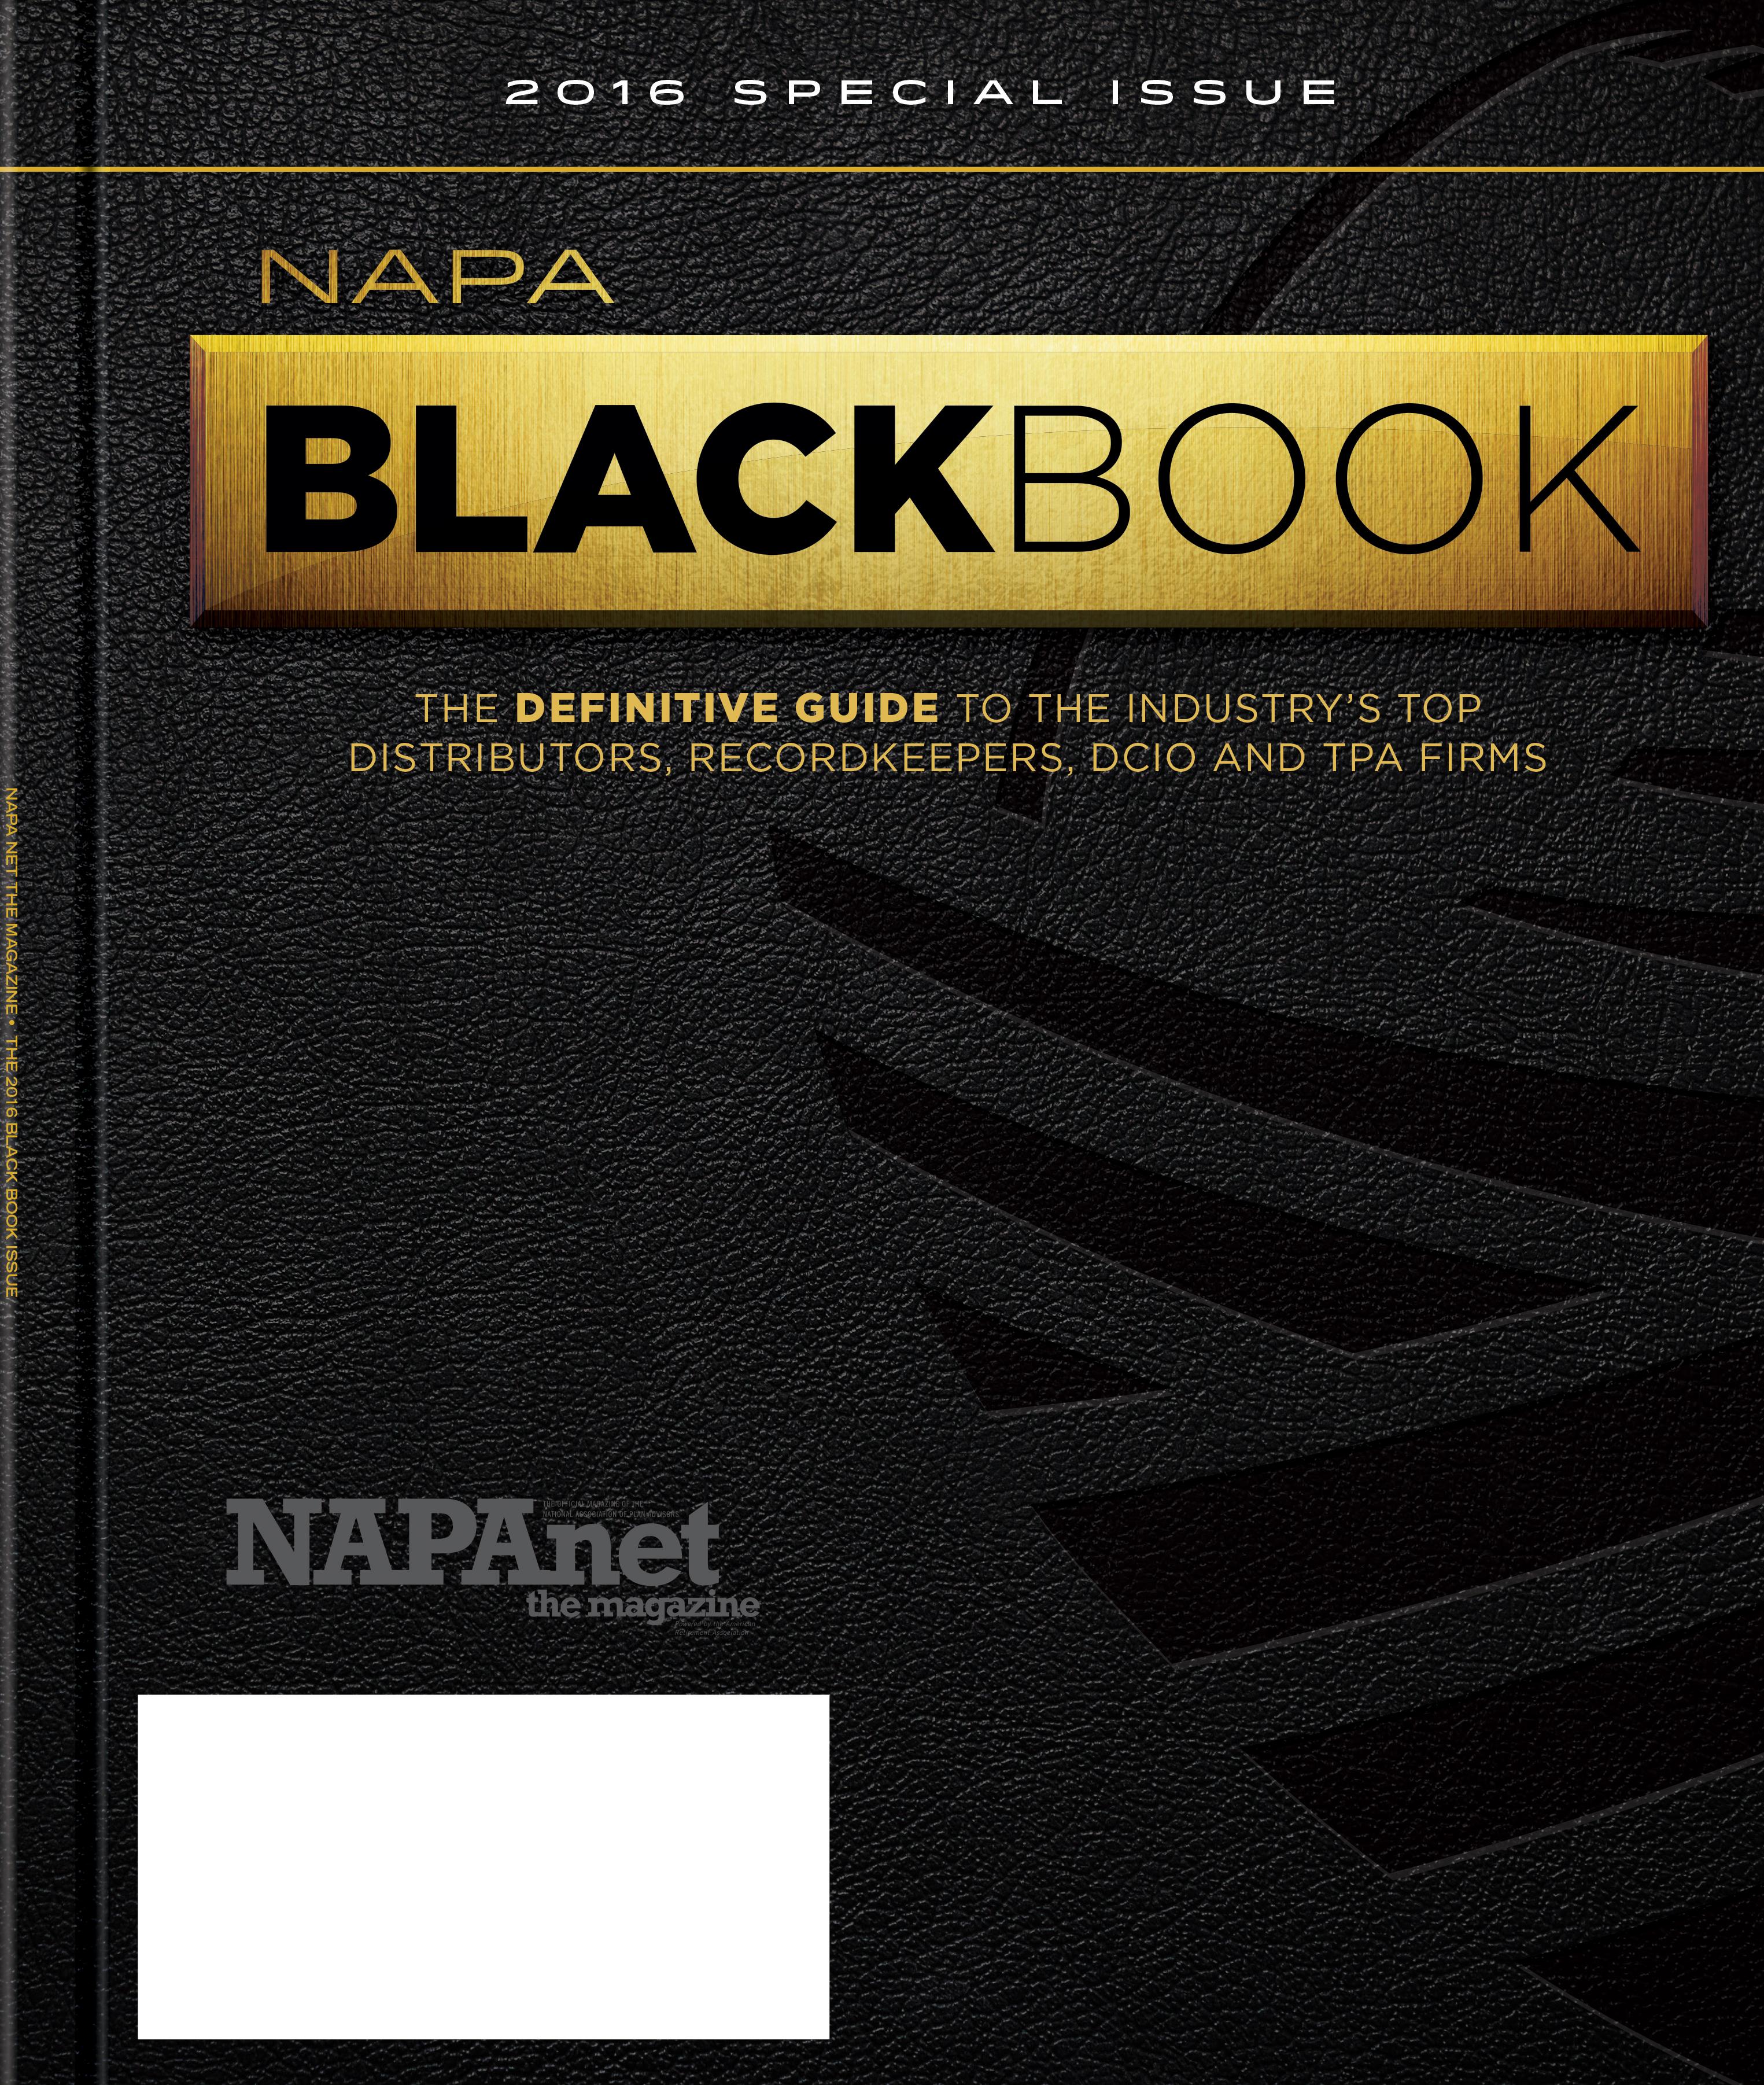 NAPA Black Book - NAPA Net